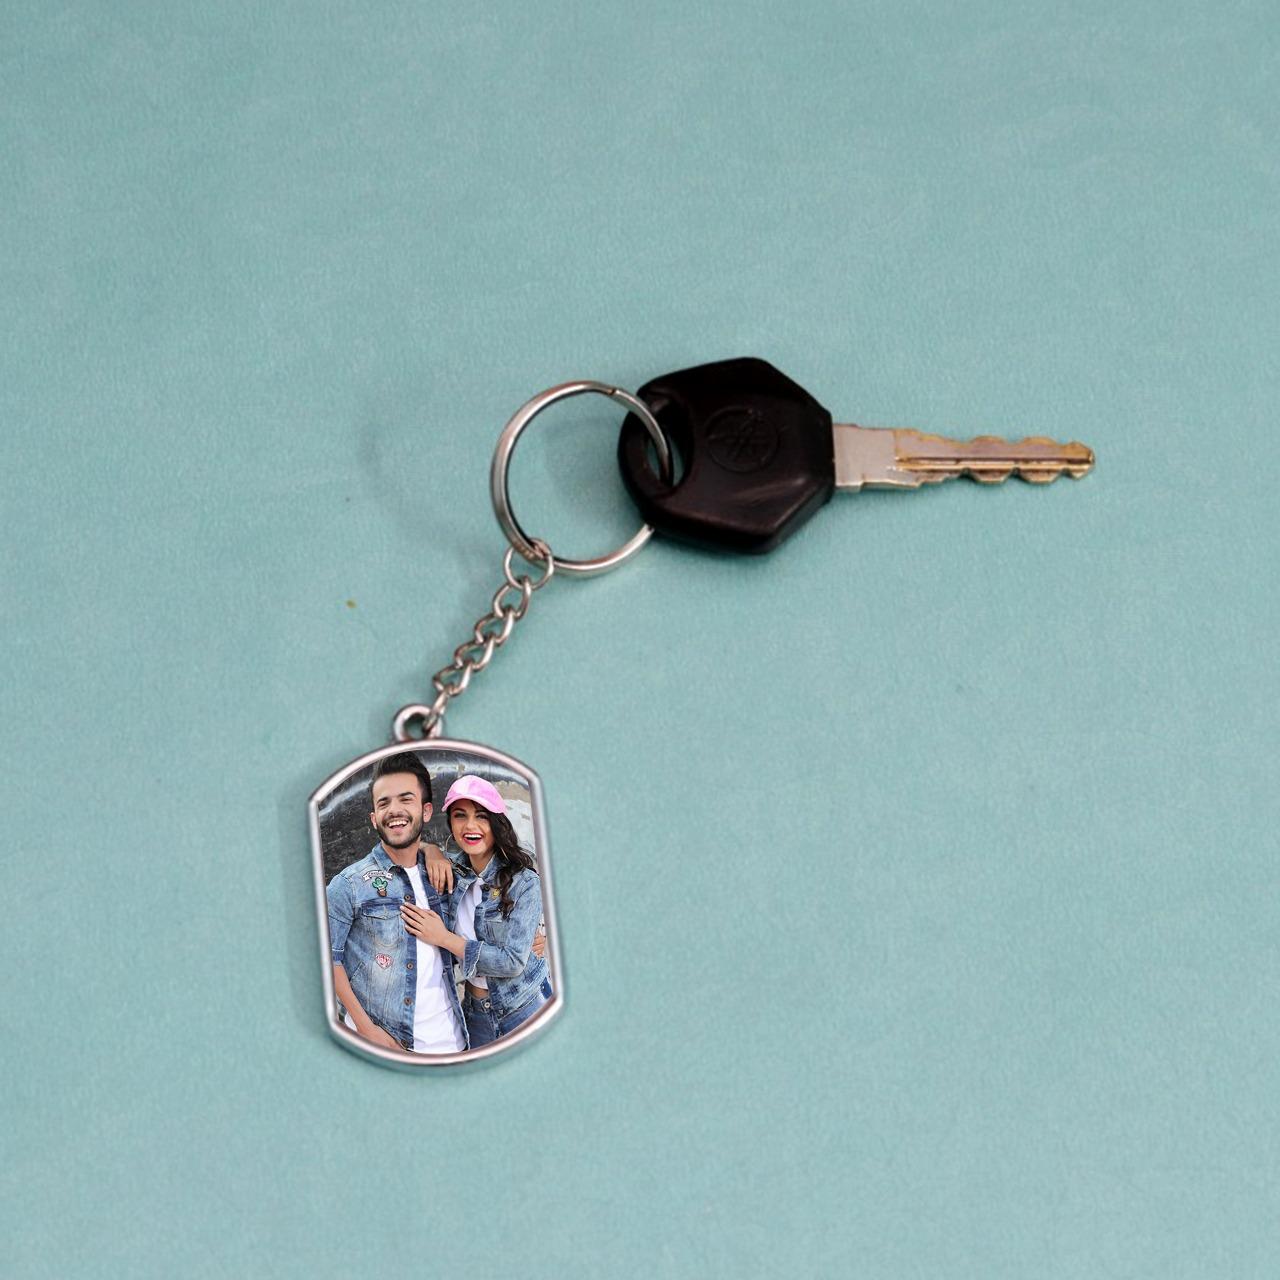 Personalized Duble Side Matel Key Chain